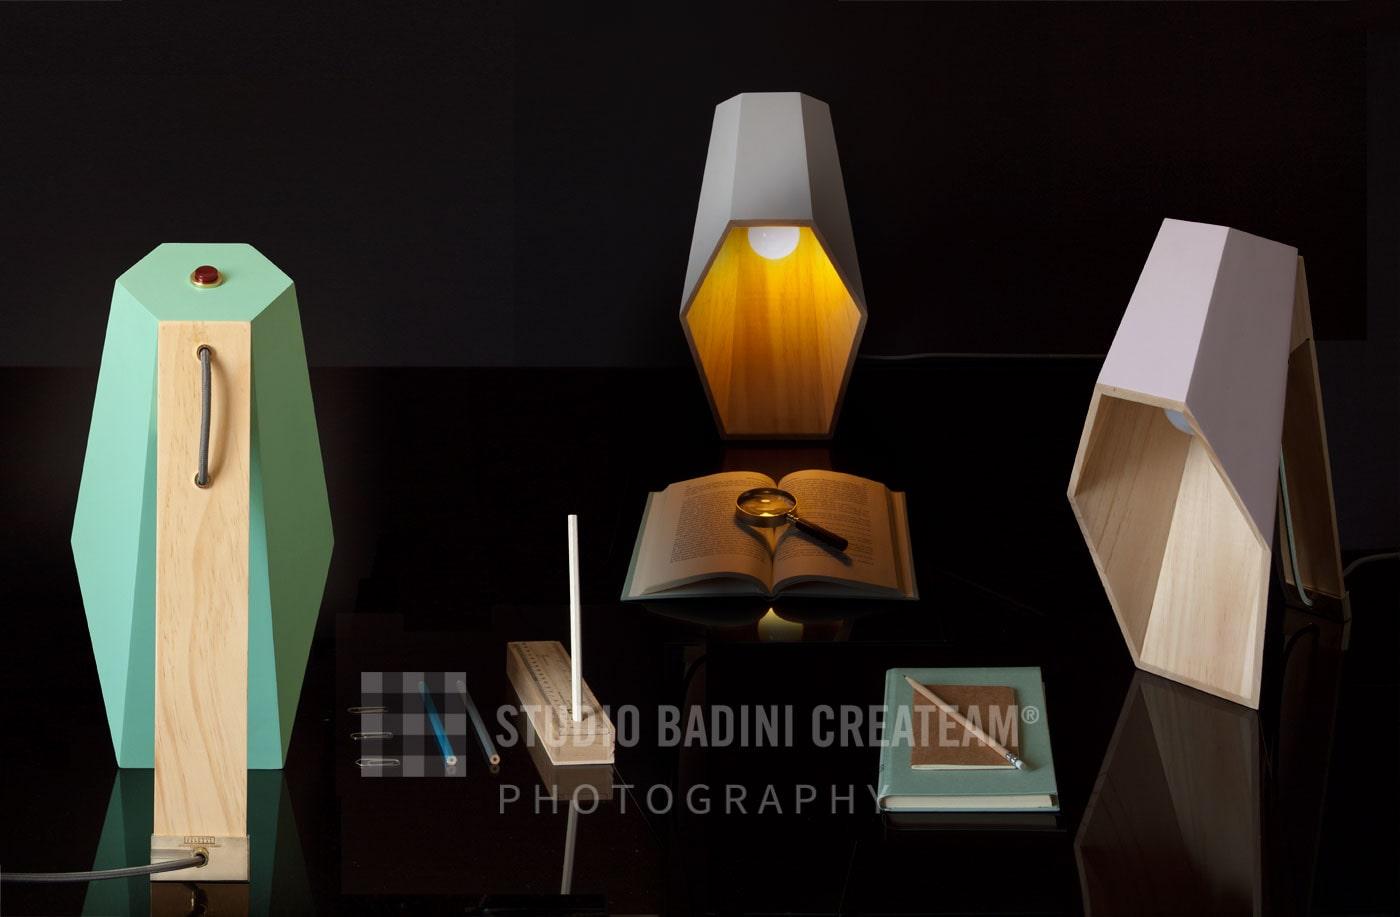 Badini Creative Studio - fotografia - seletti - woodspot